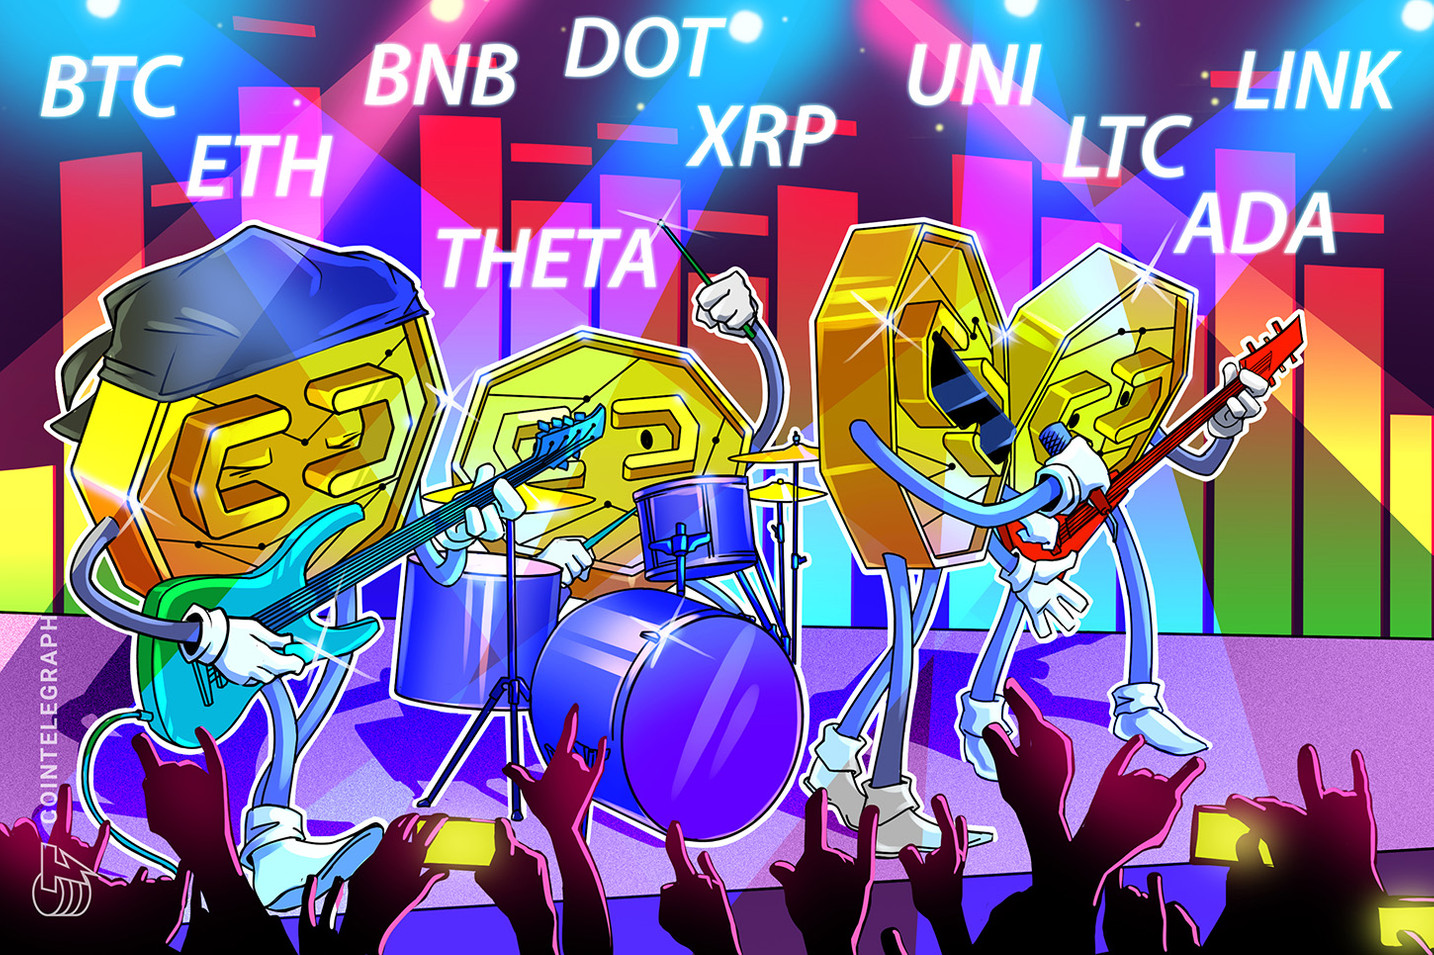 Análise de preço 29/03: BTC, ETH, BNB, ADA, DOT, XRP, UNI, THETA, LTC, LINK